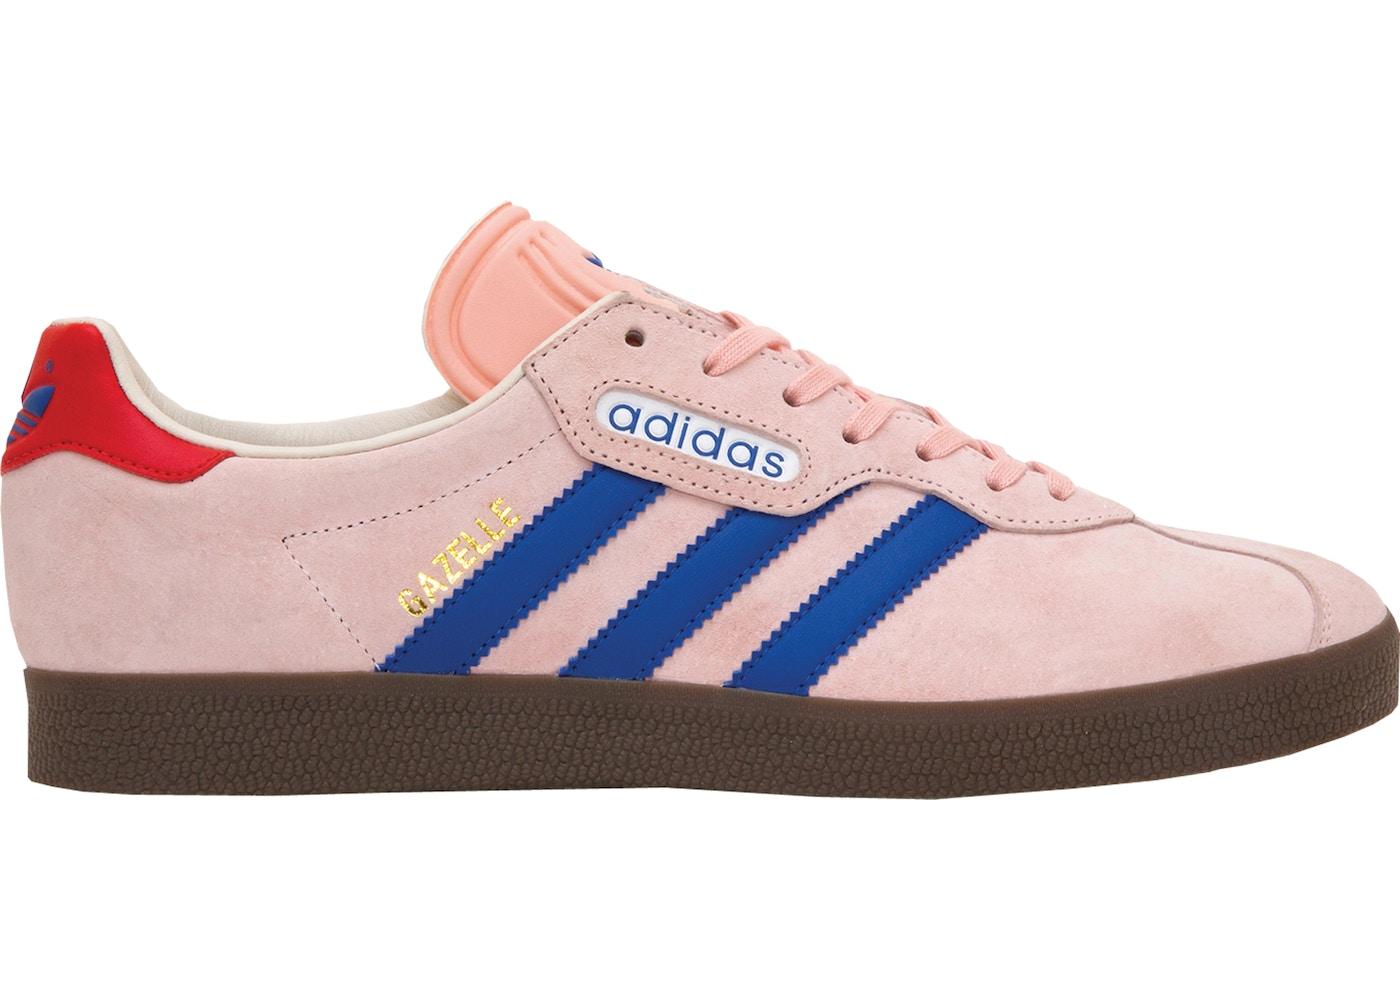 adidas Gazelle Super size? London to Manchester Pink - CQ1882